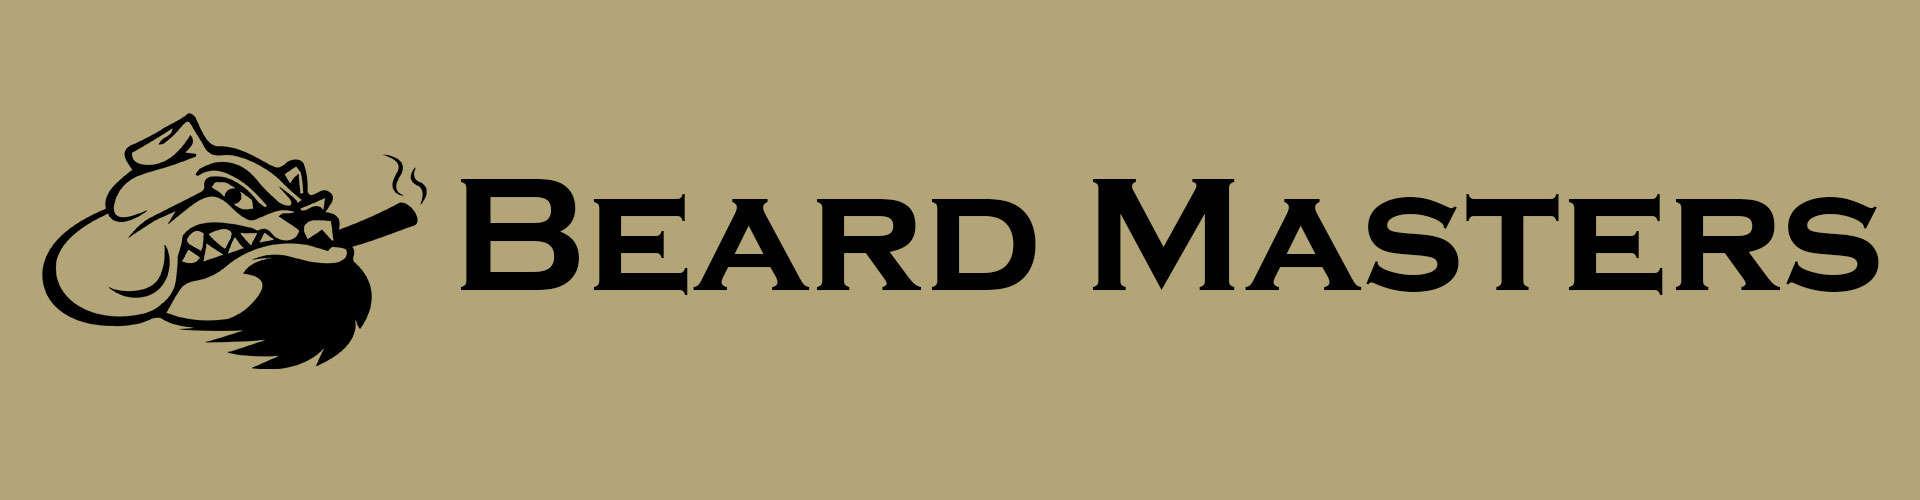 Beard Masters from Beard Juice